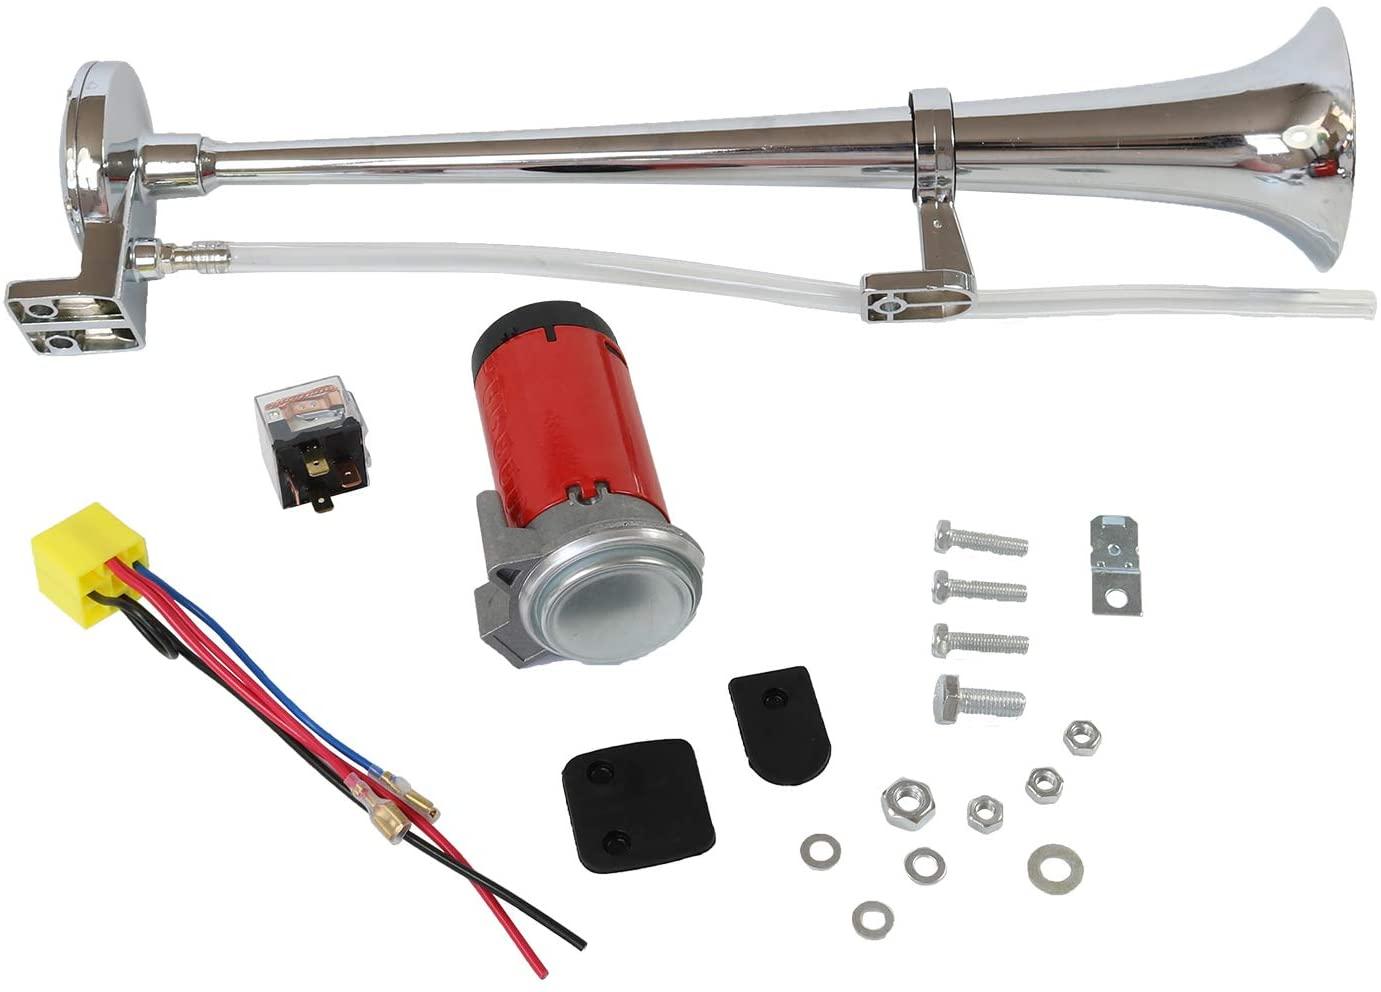 JDMSPEED New Single Trumpet Kit Air Horn Compressor Super Loud Car Lorry Boat 12V 150DB